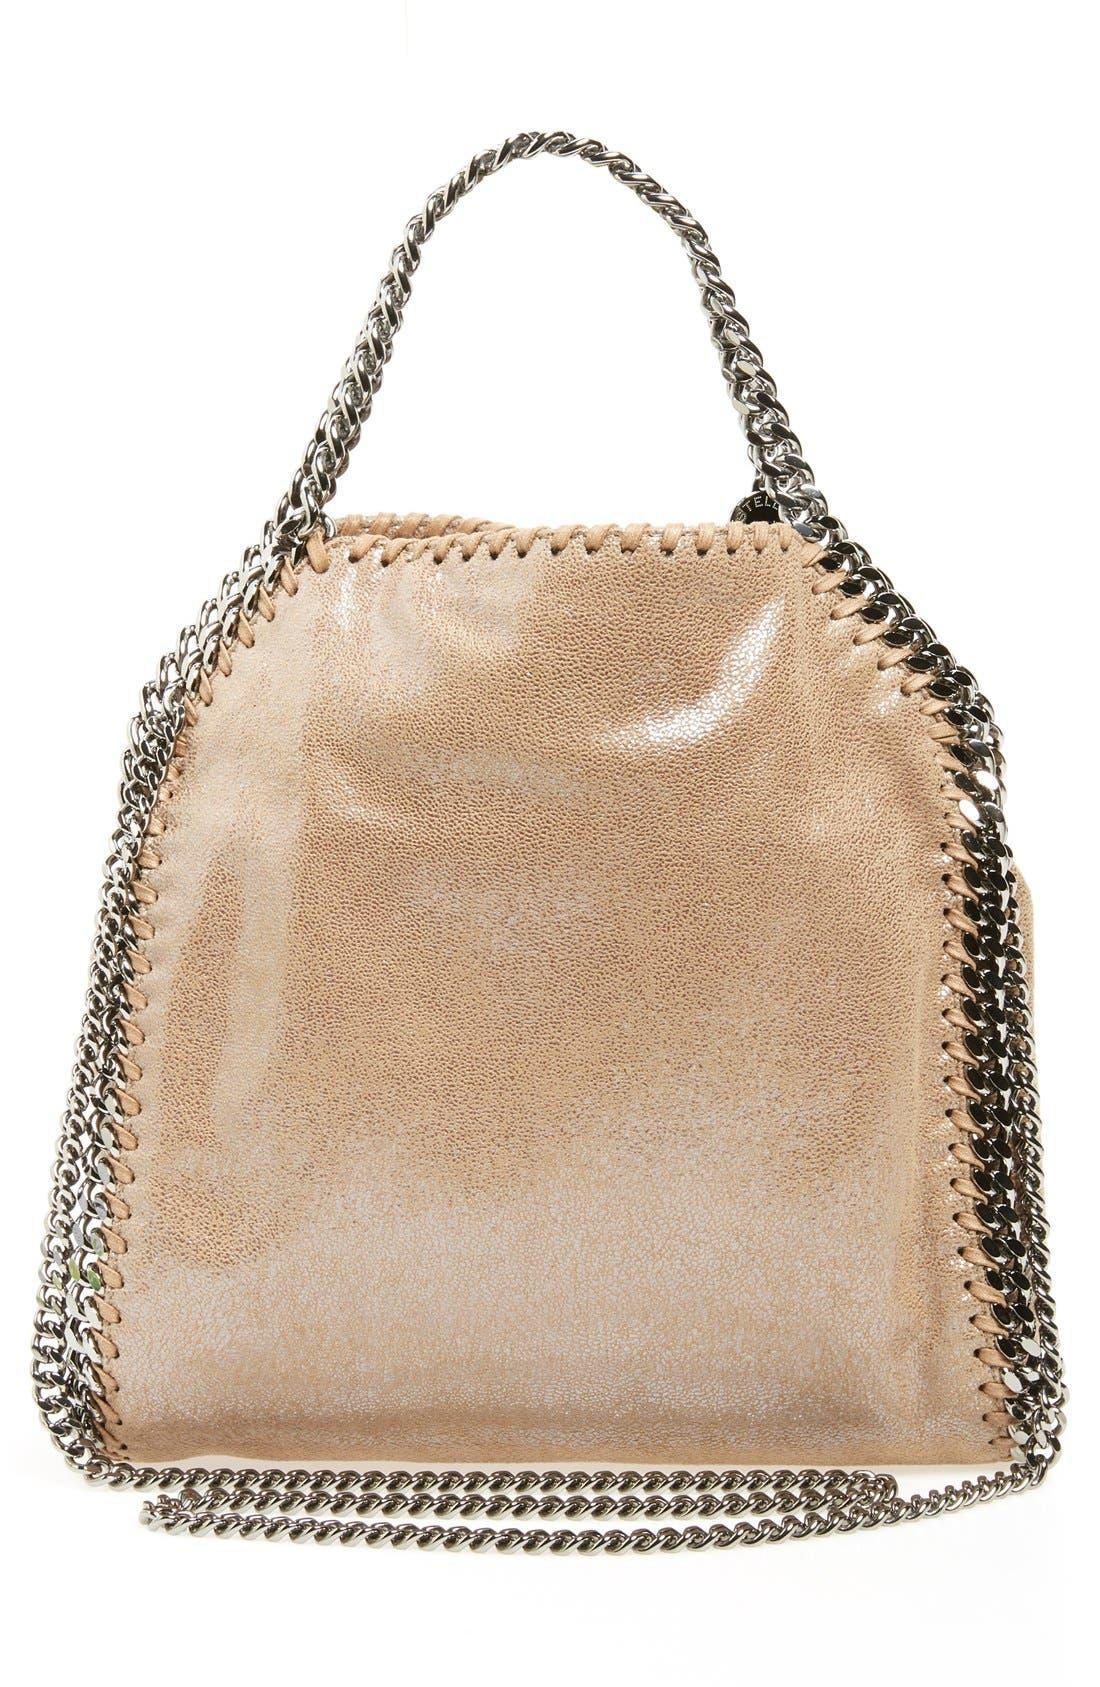 Alternate Image 3  - Stella McCartney 'Mini Falabella' Faux Leather Crossbody Bag